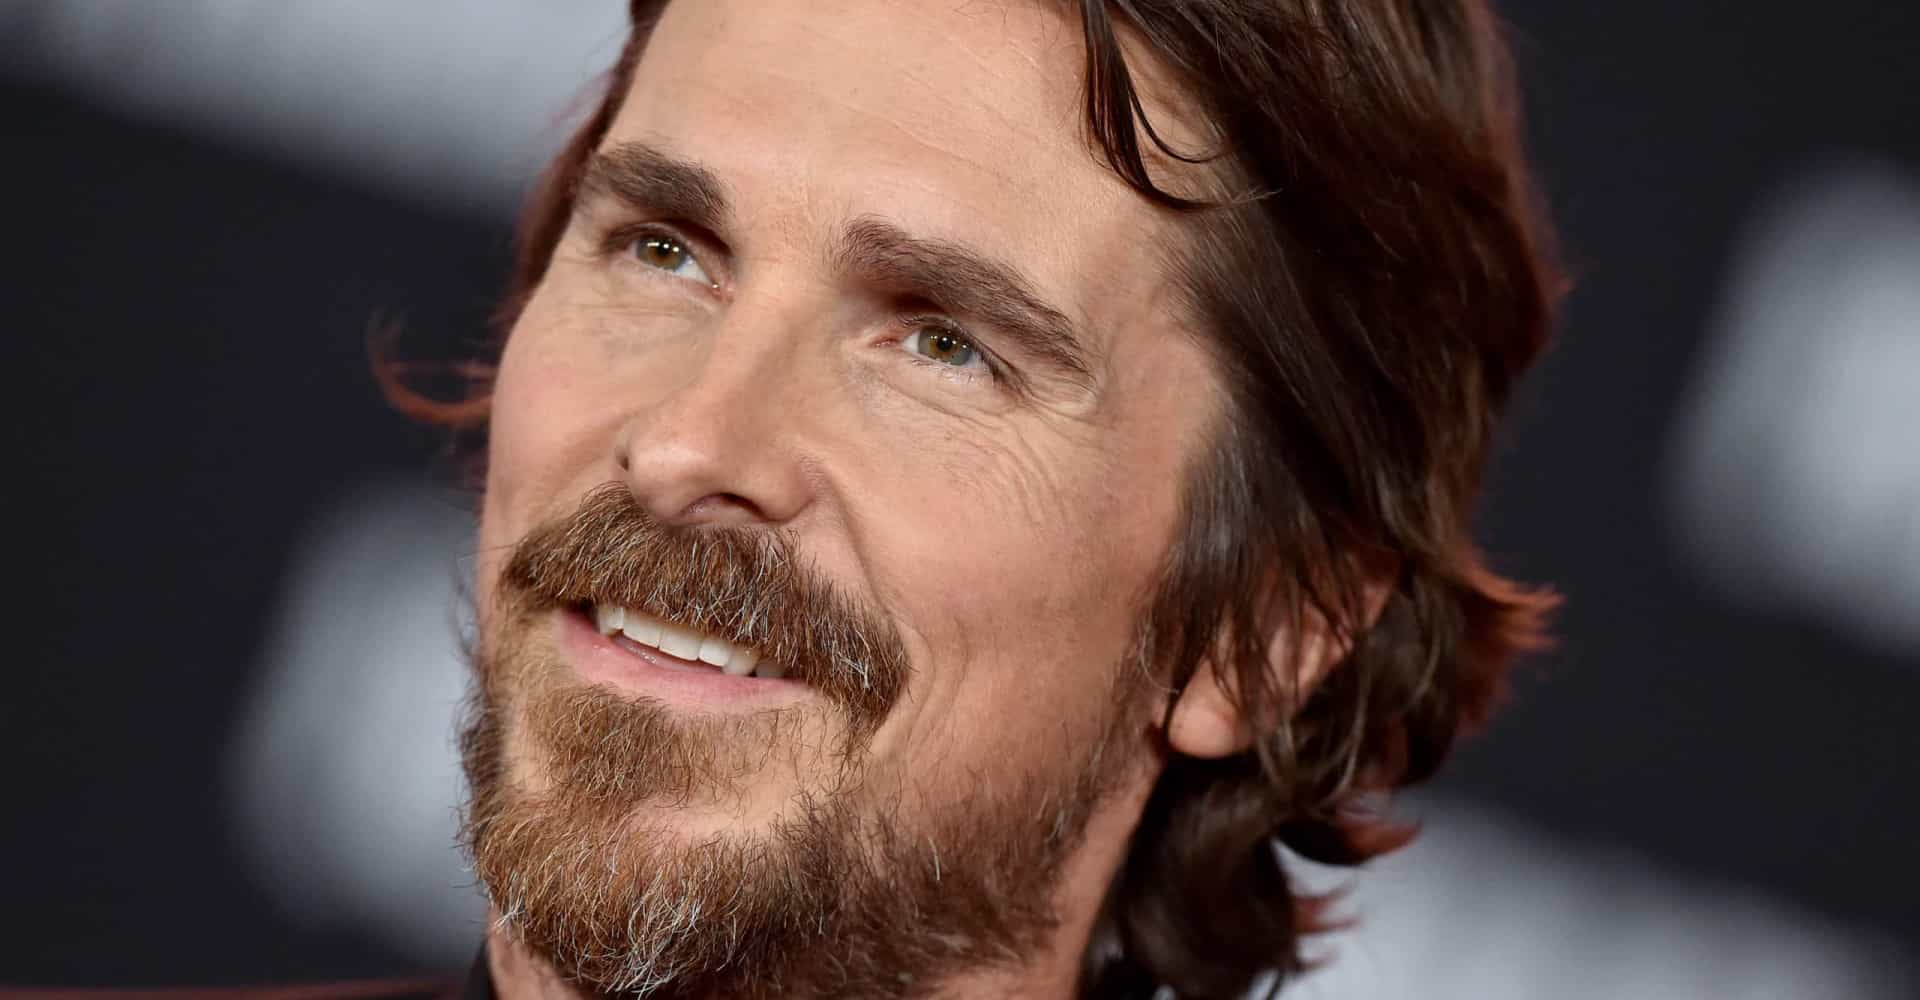 Christian Bale: Hollywood hero, or villain?